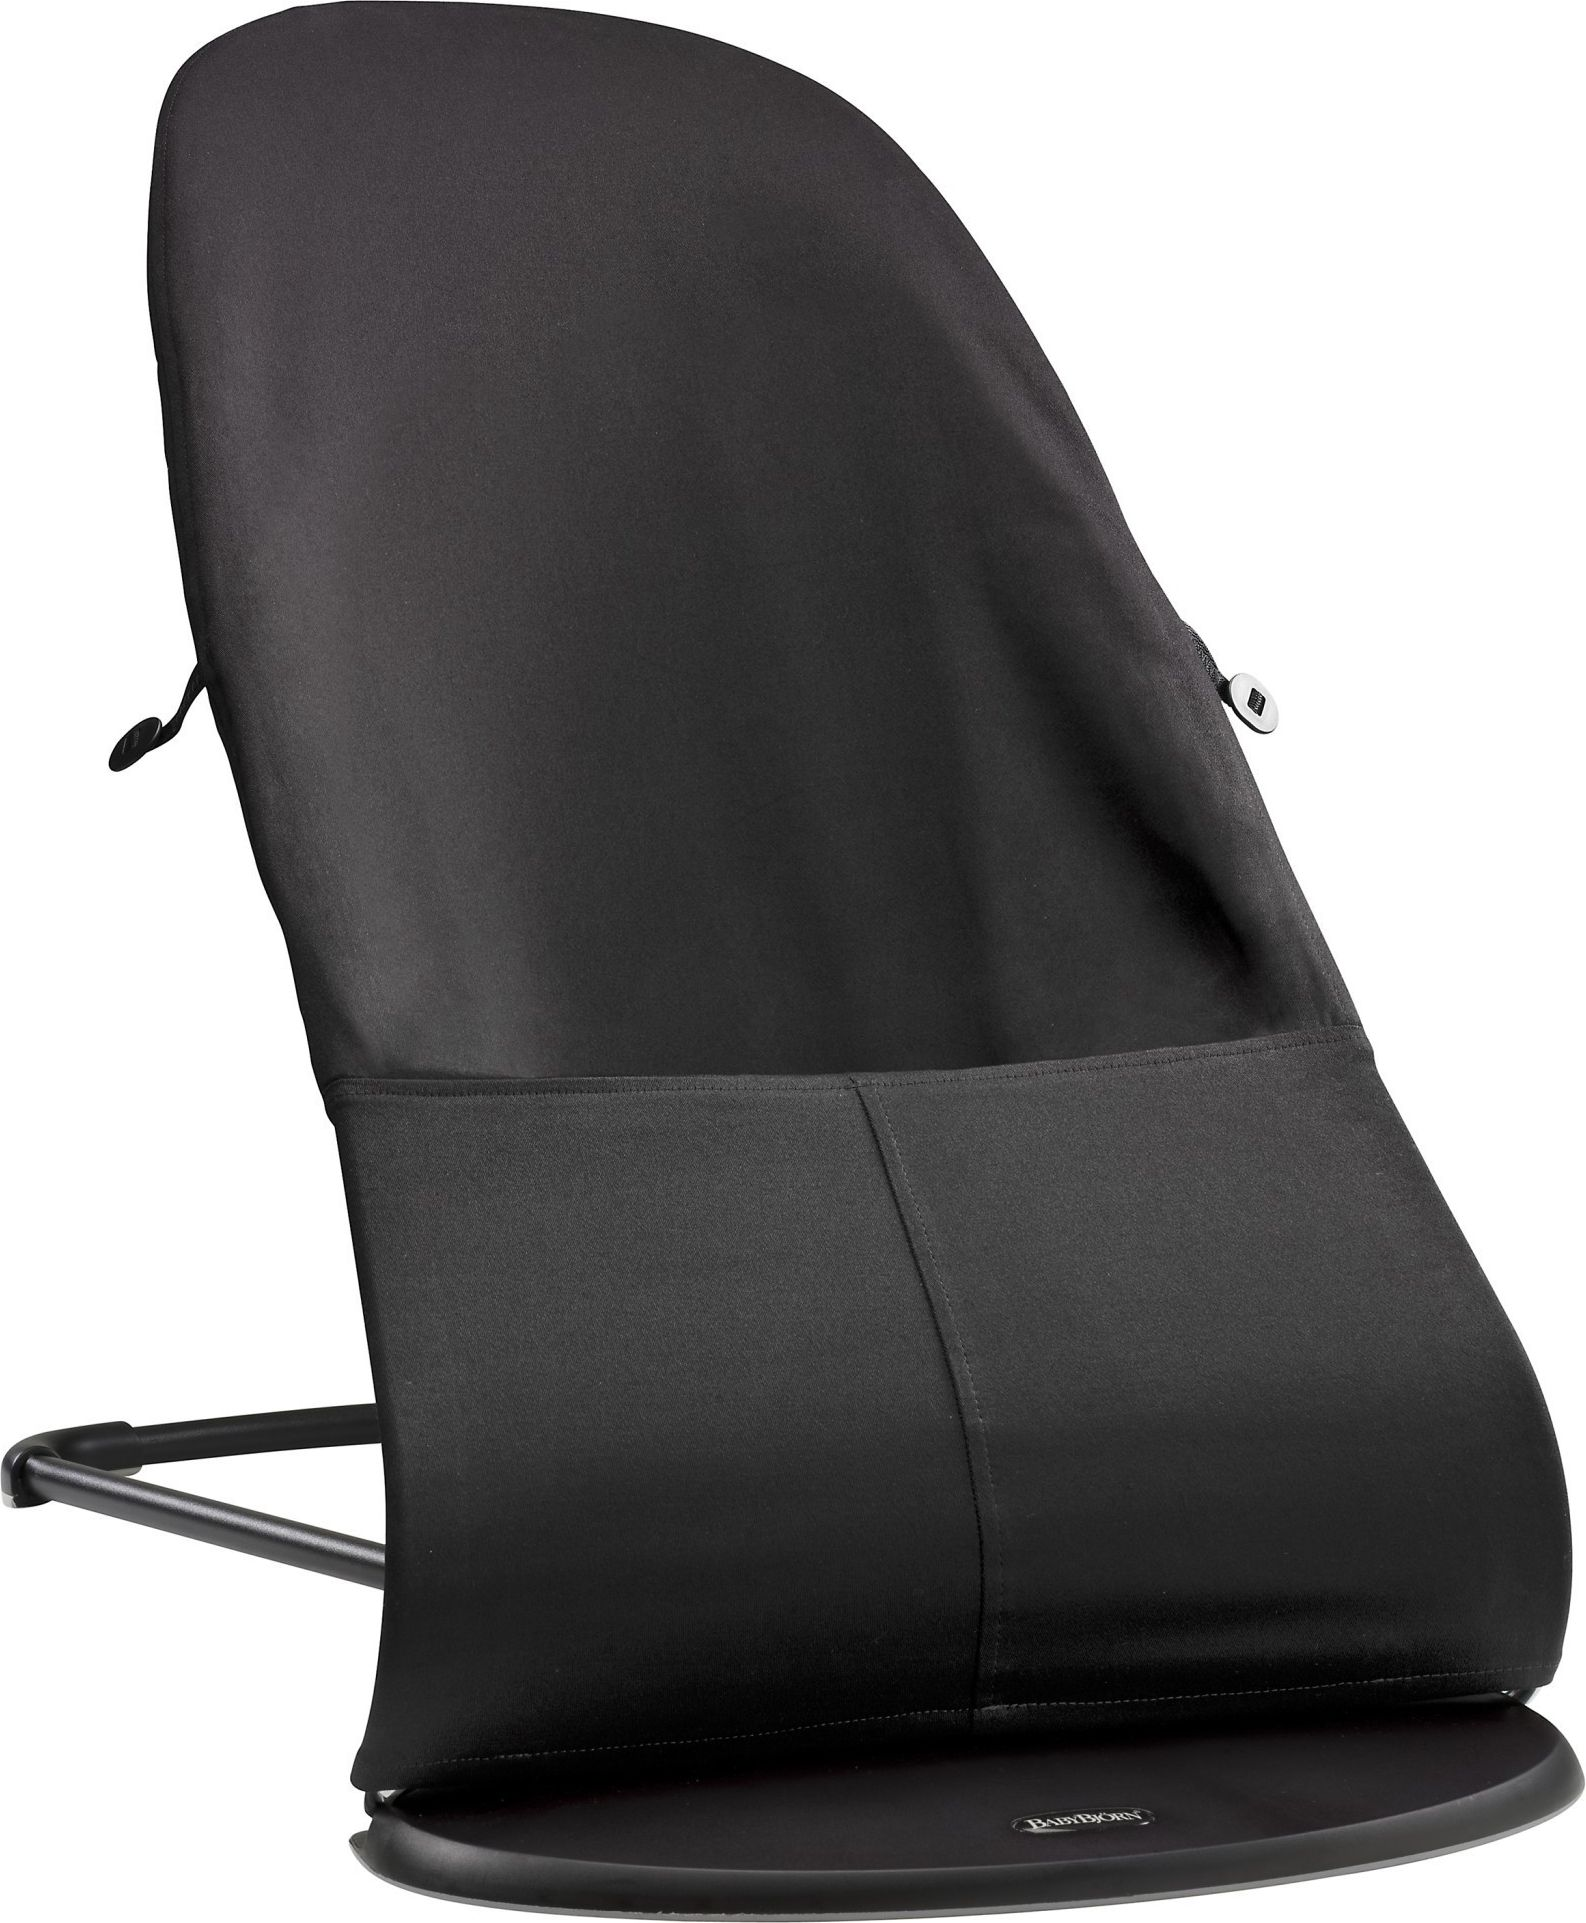 BABYBJORN Bouncer Balance Soft Black/Darkgrey šūpuļkrēsls